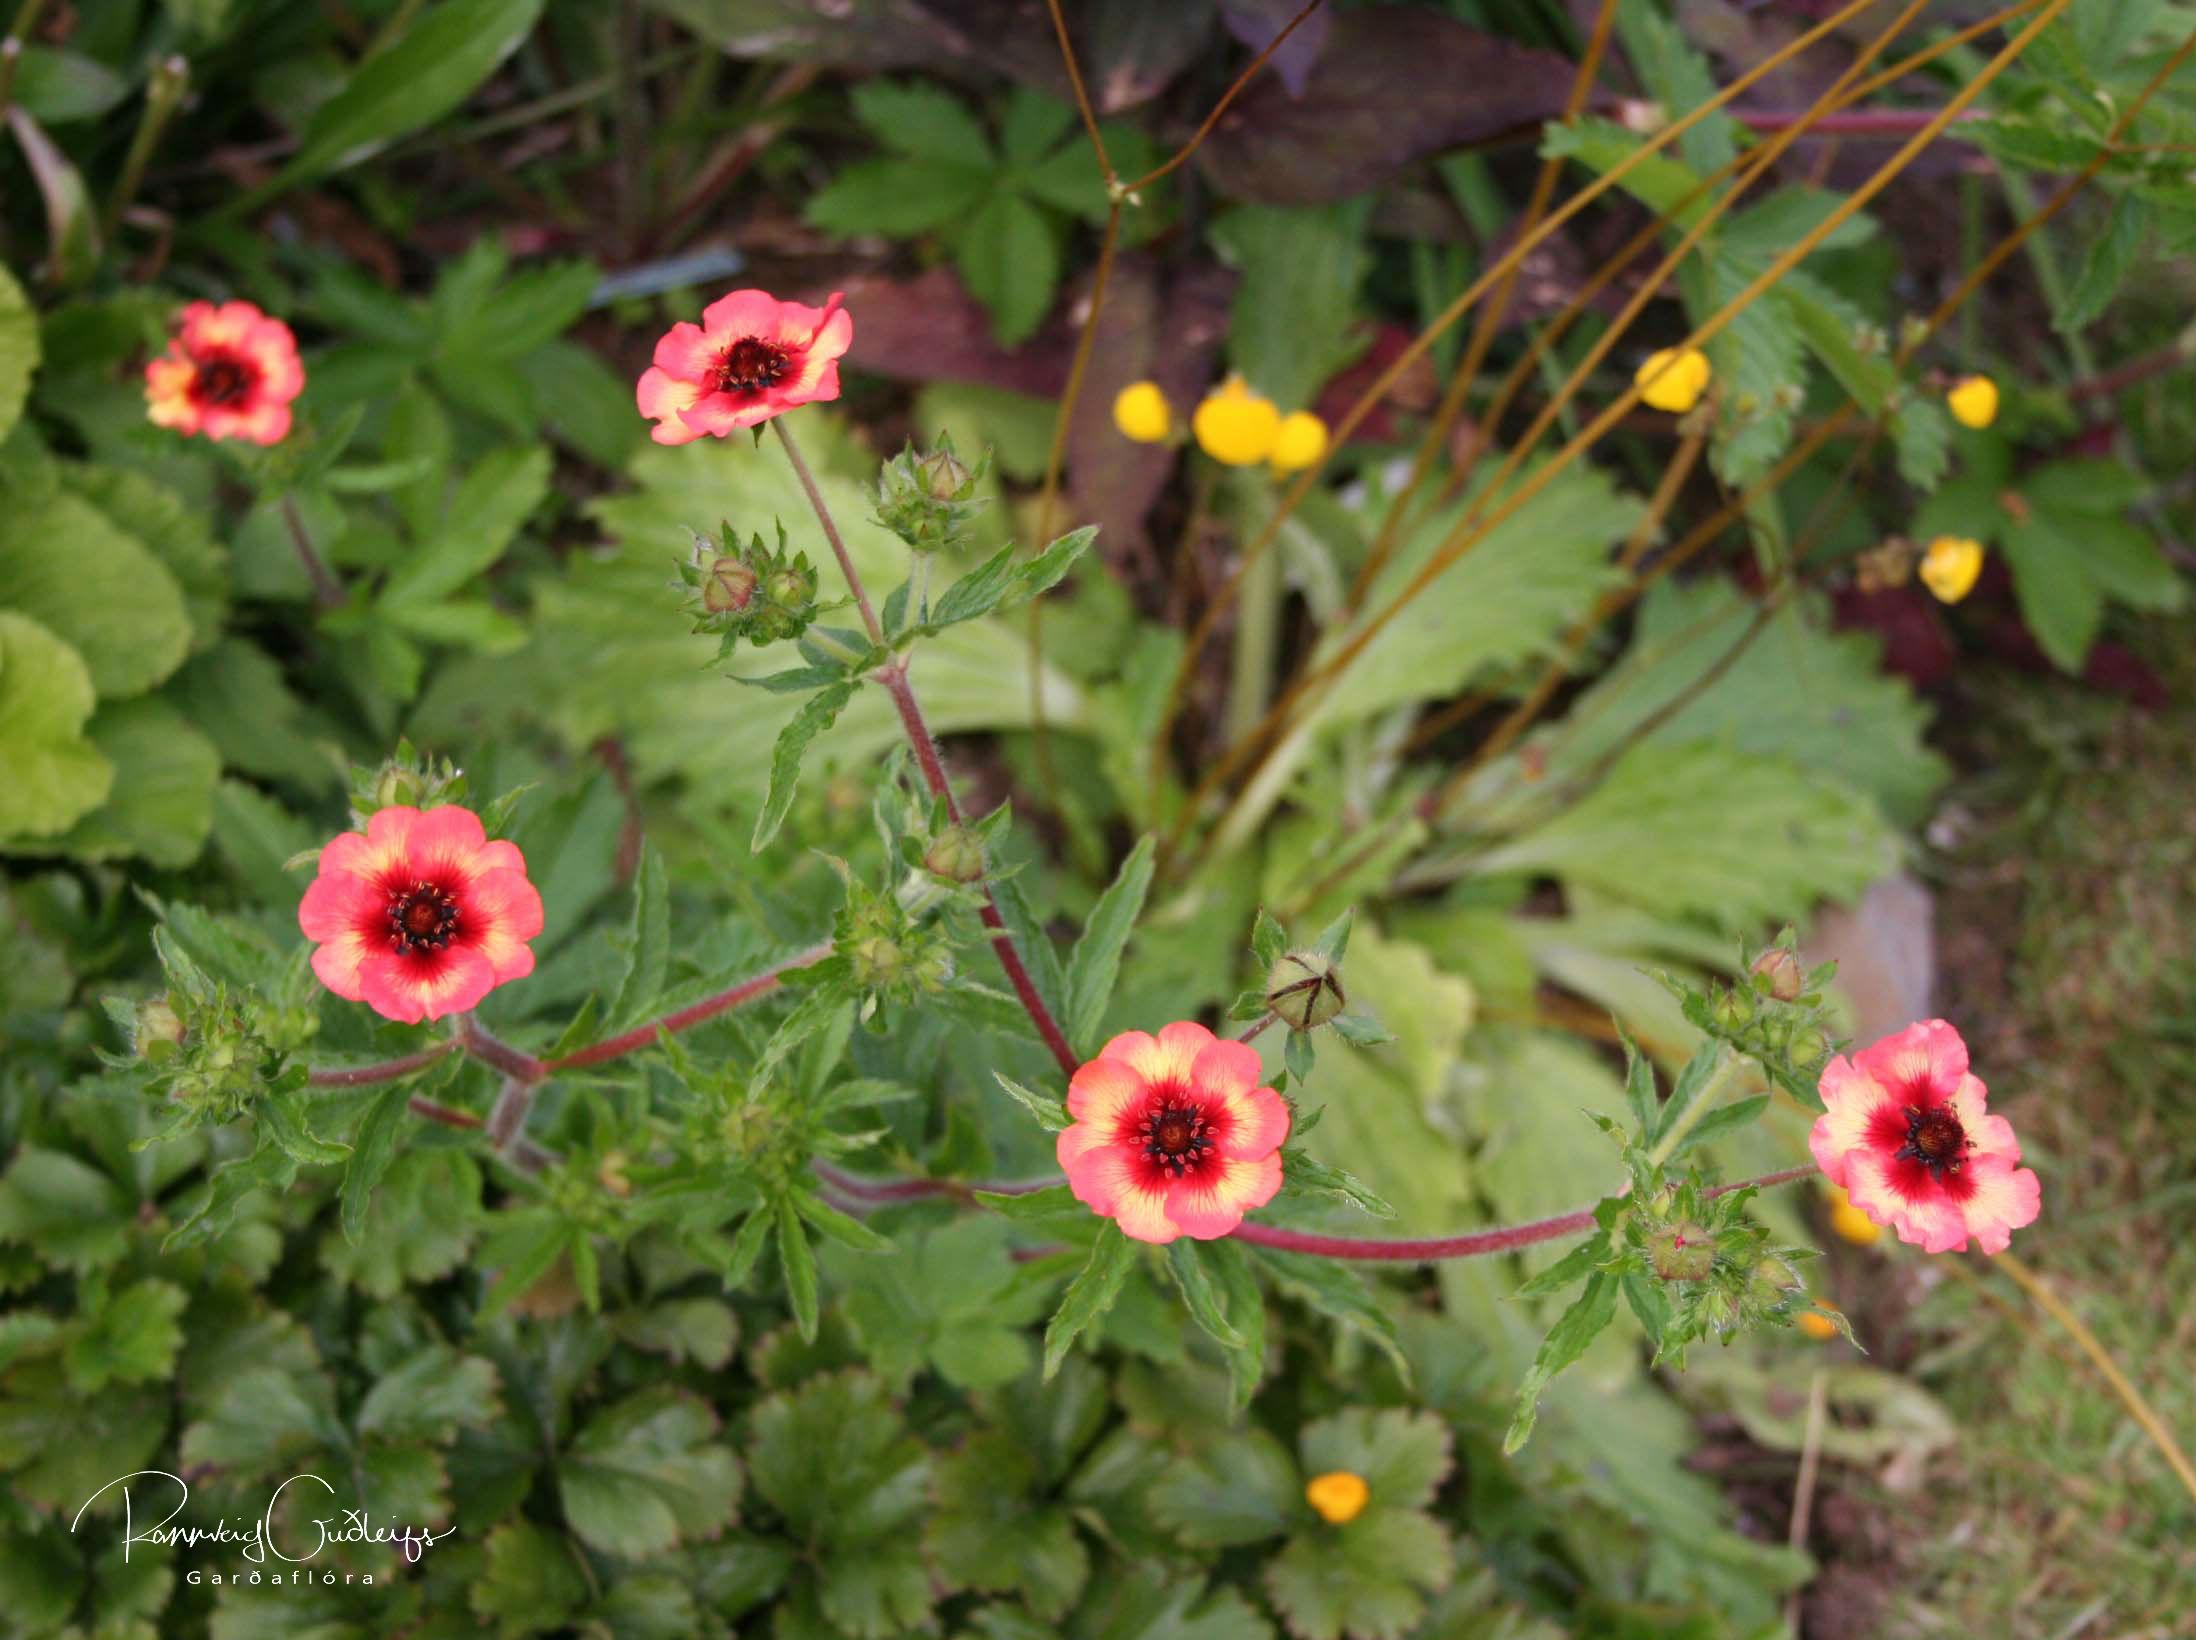 Potentilla nepalensis 'Melton Fire'